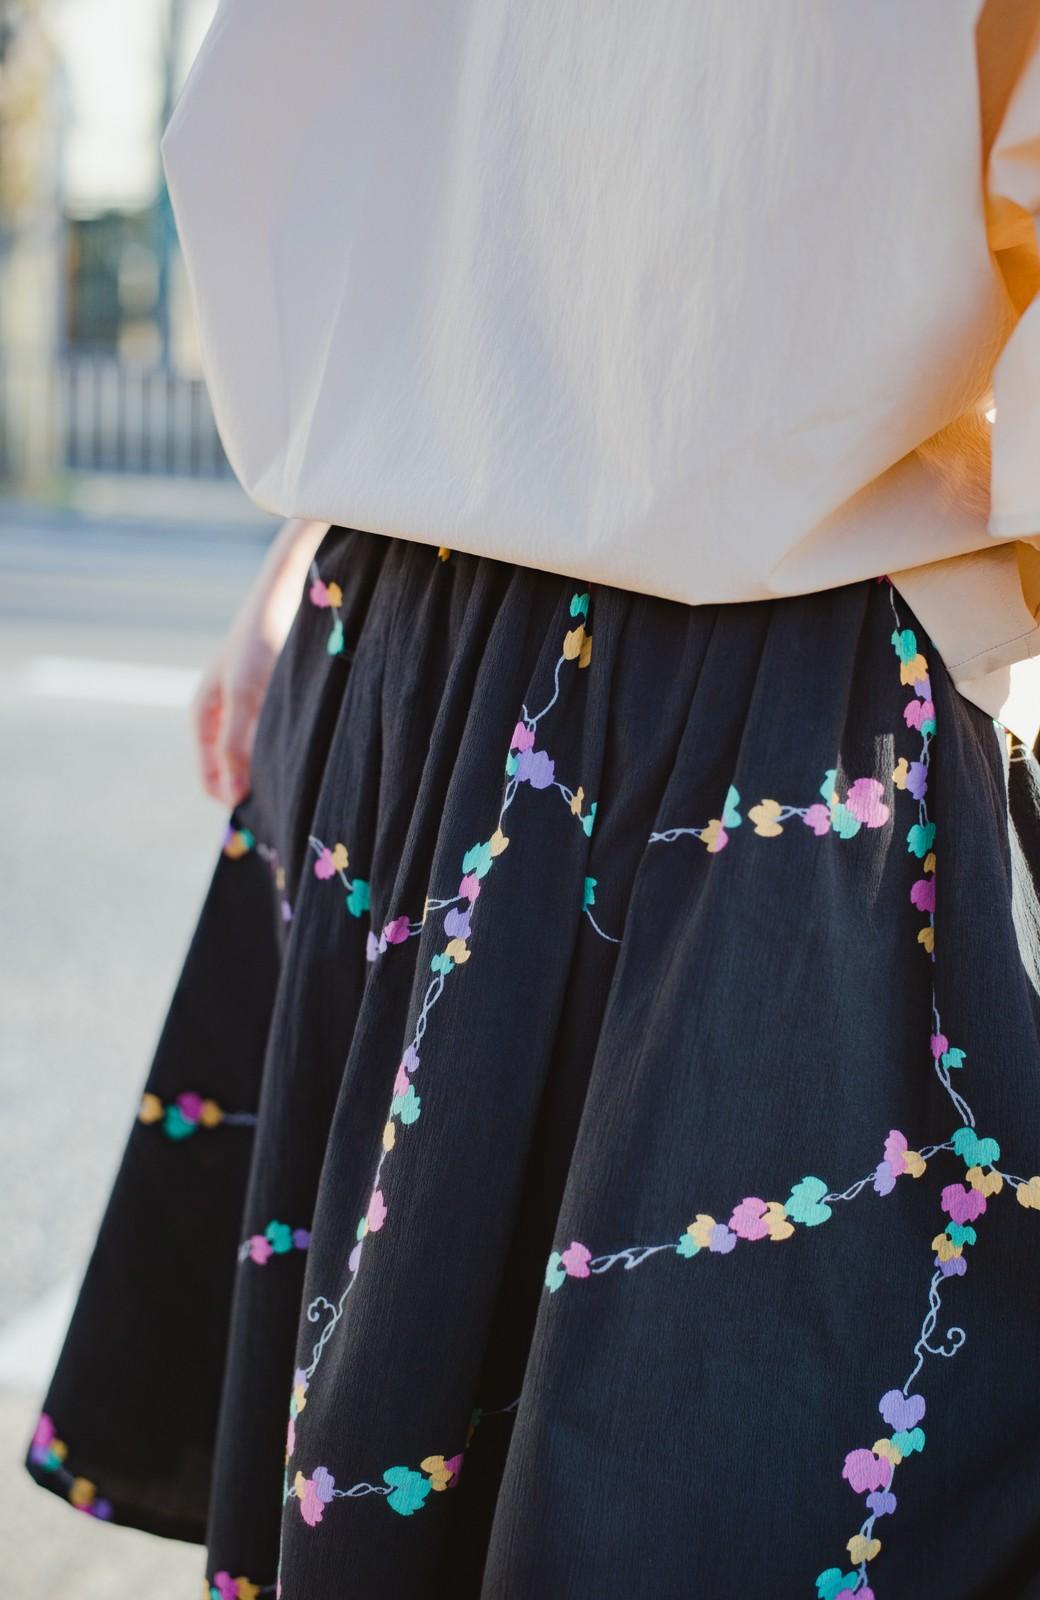 haco! 京都の浴衣屋さんと作った浴衣生地のスカート <ブラック系その他>の商品写真4